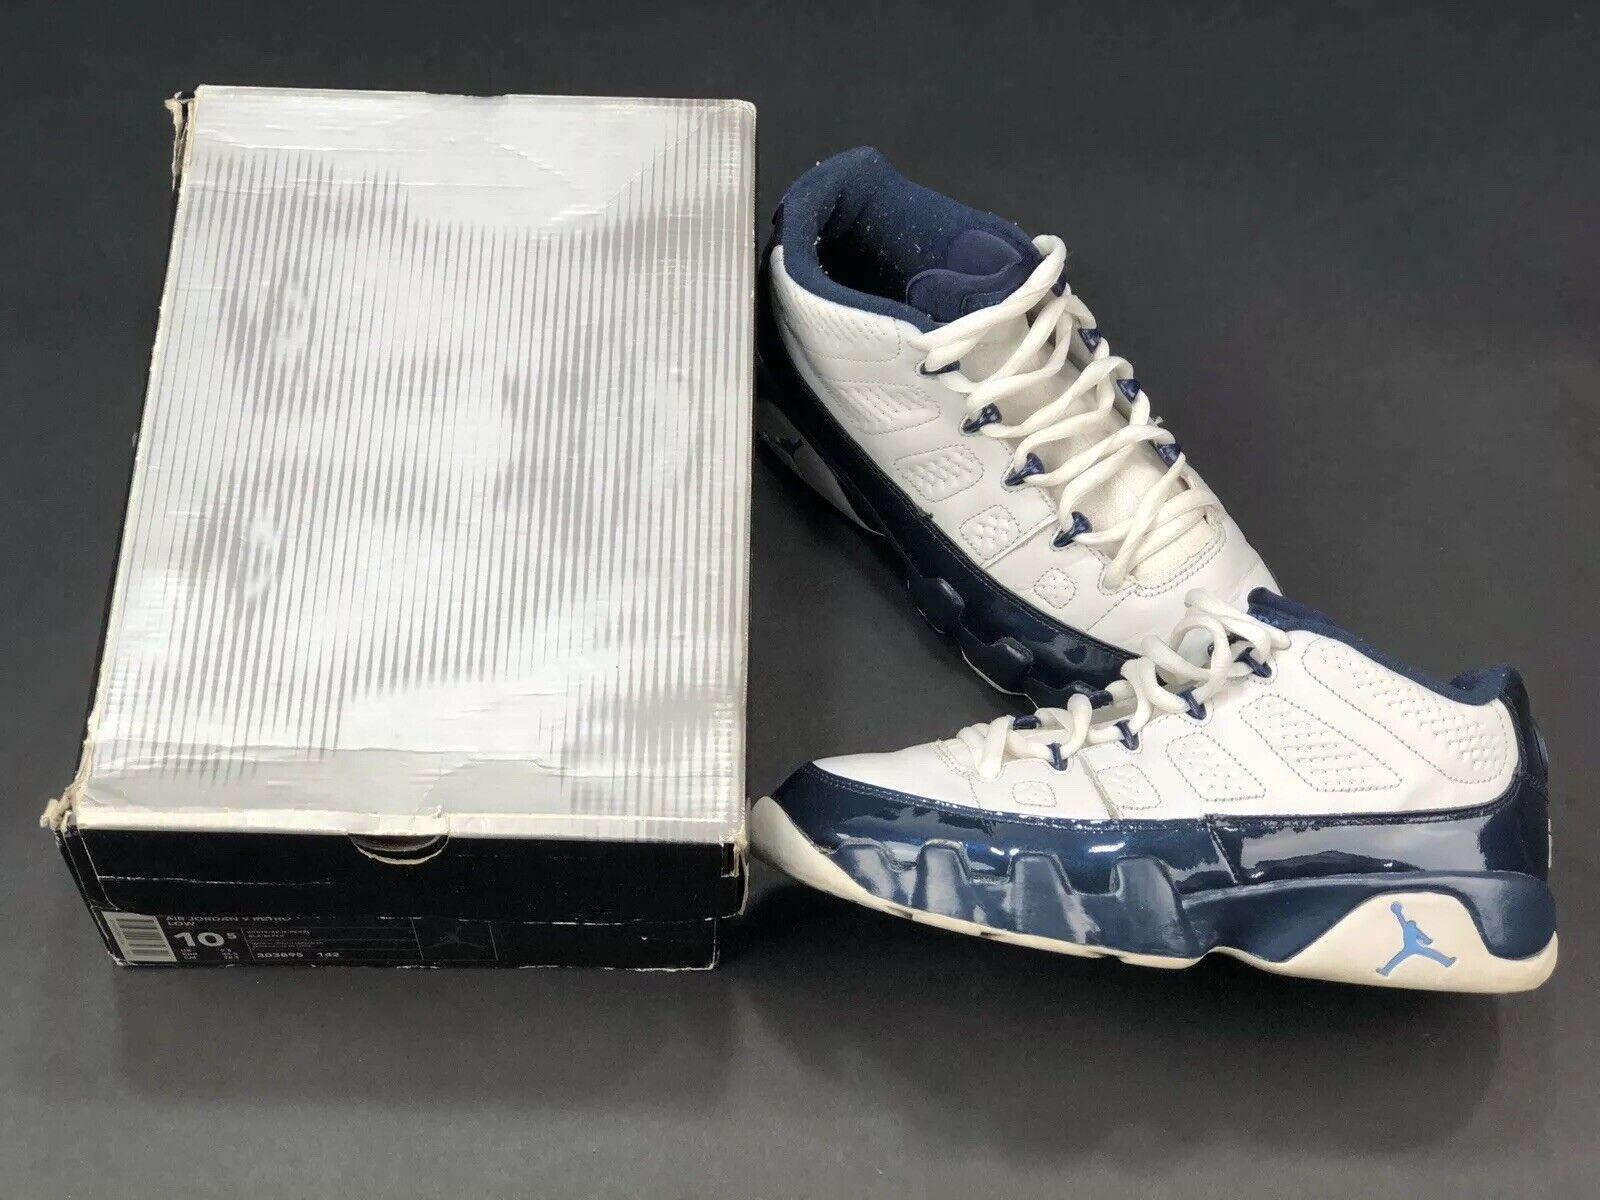 Nike Air Jordan Pearl bluee UNC 9 Low OG 2002 Rare Kith Retro 23 Infrared 10.5